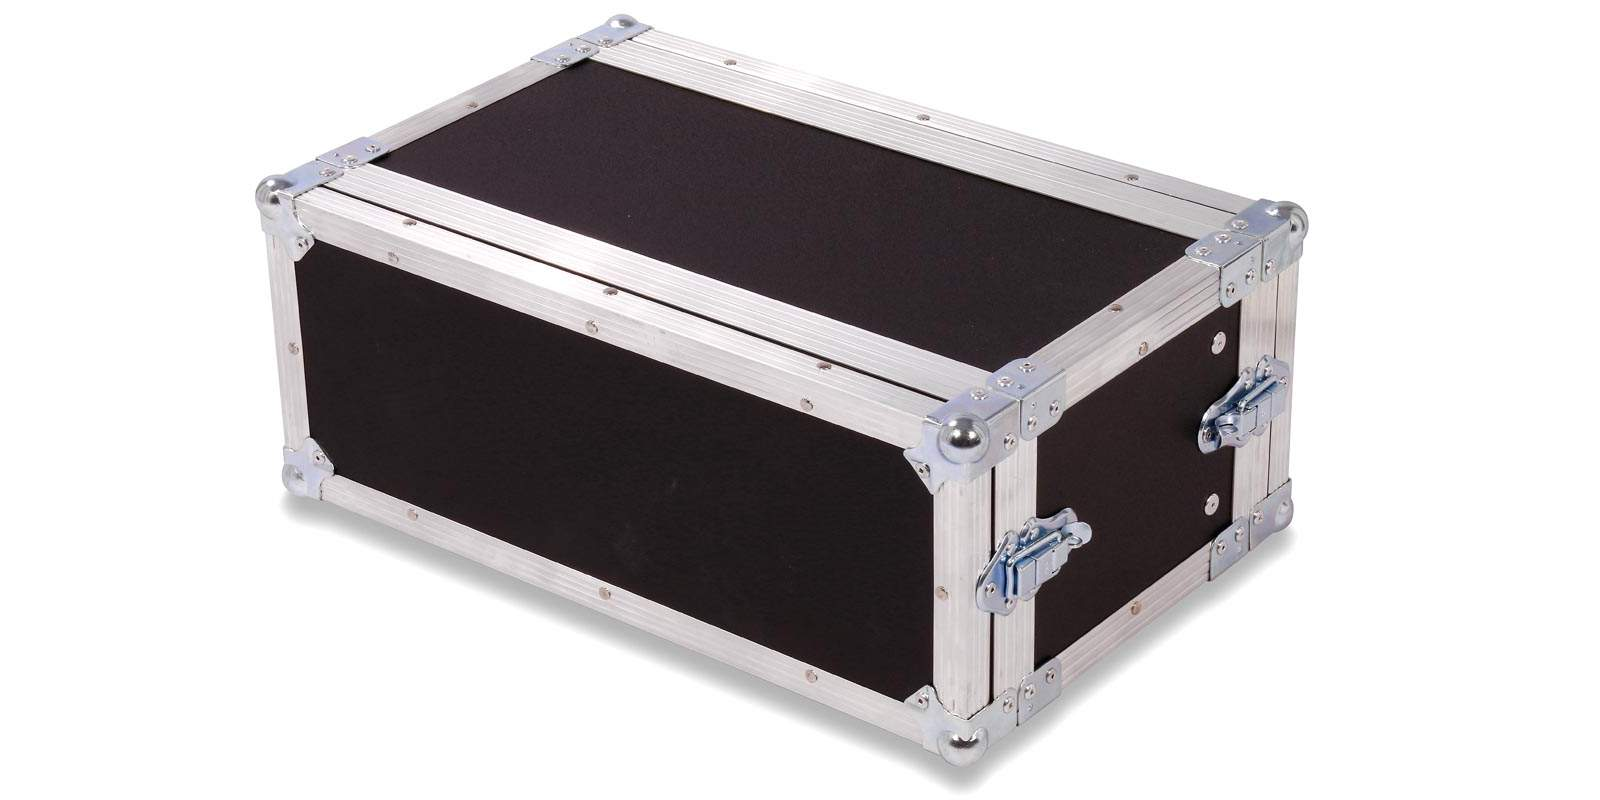 LT-Case 6 HE ECO II compact Rack 23 cm phenol